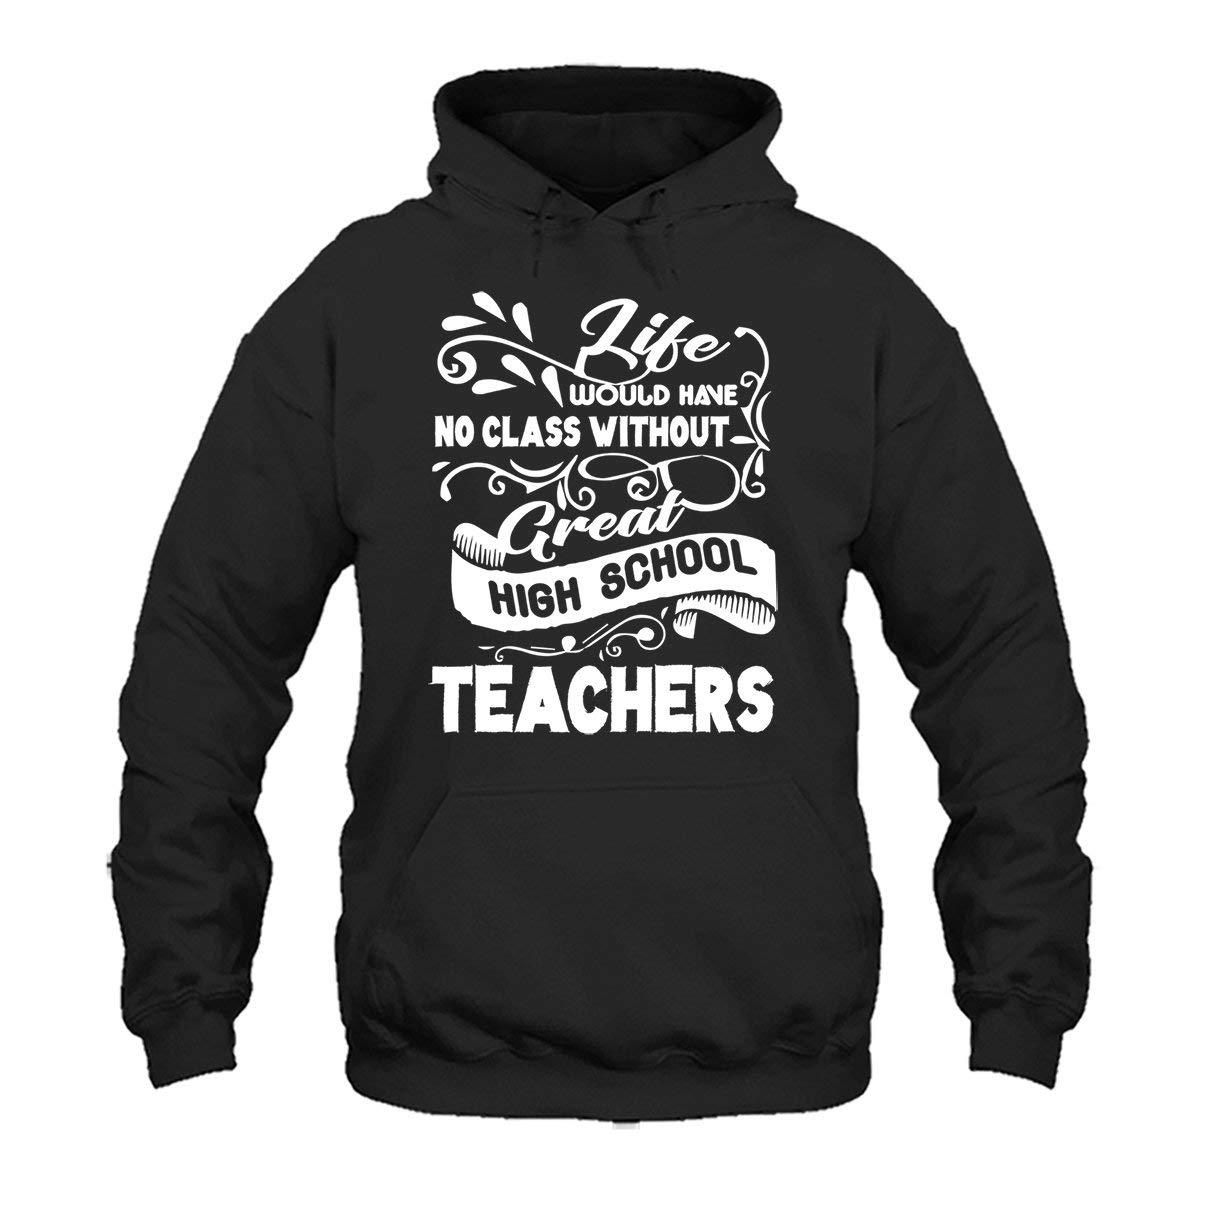 Cool Sweatshirt Two Camel Great High School Teachers Tee Shirt Hoodie